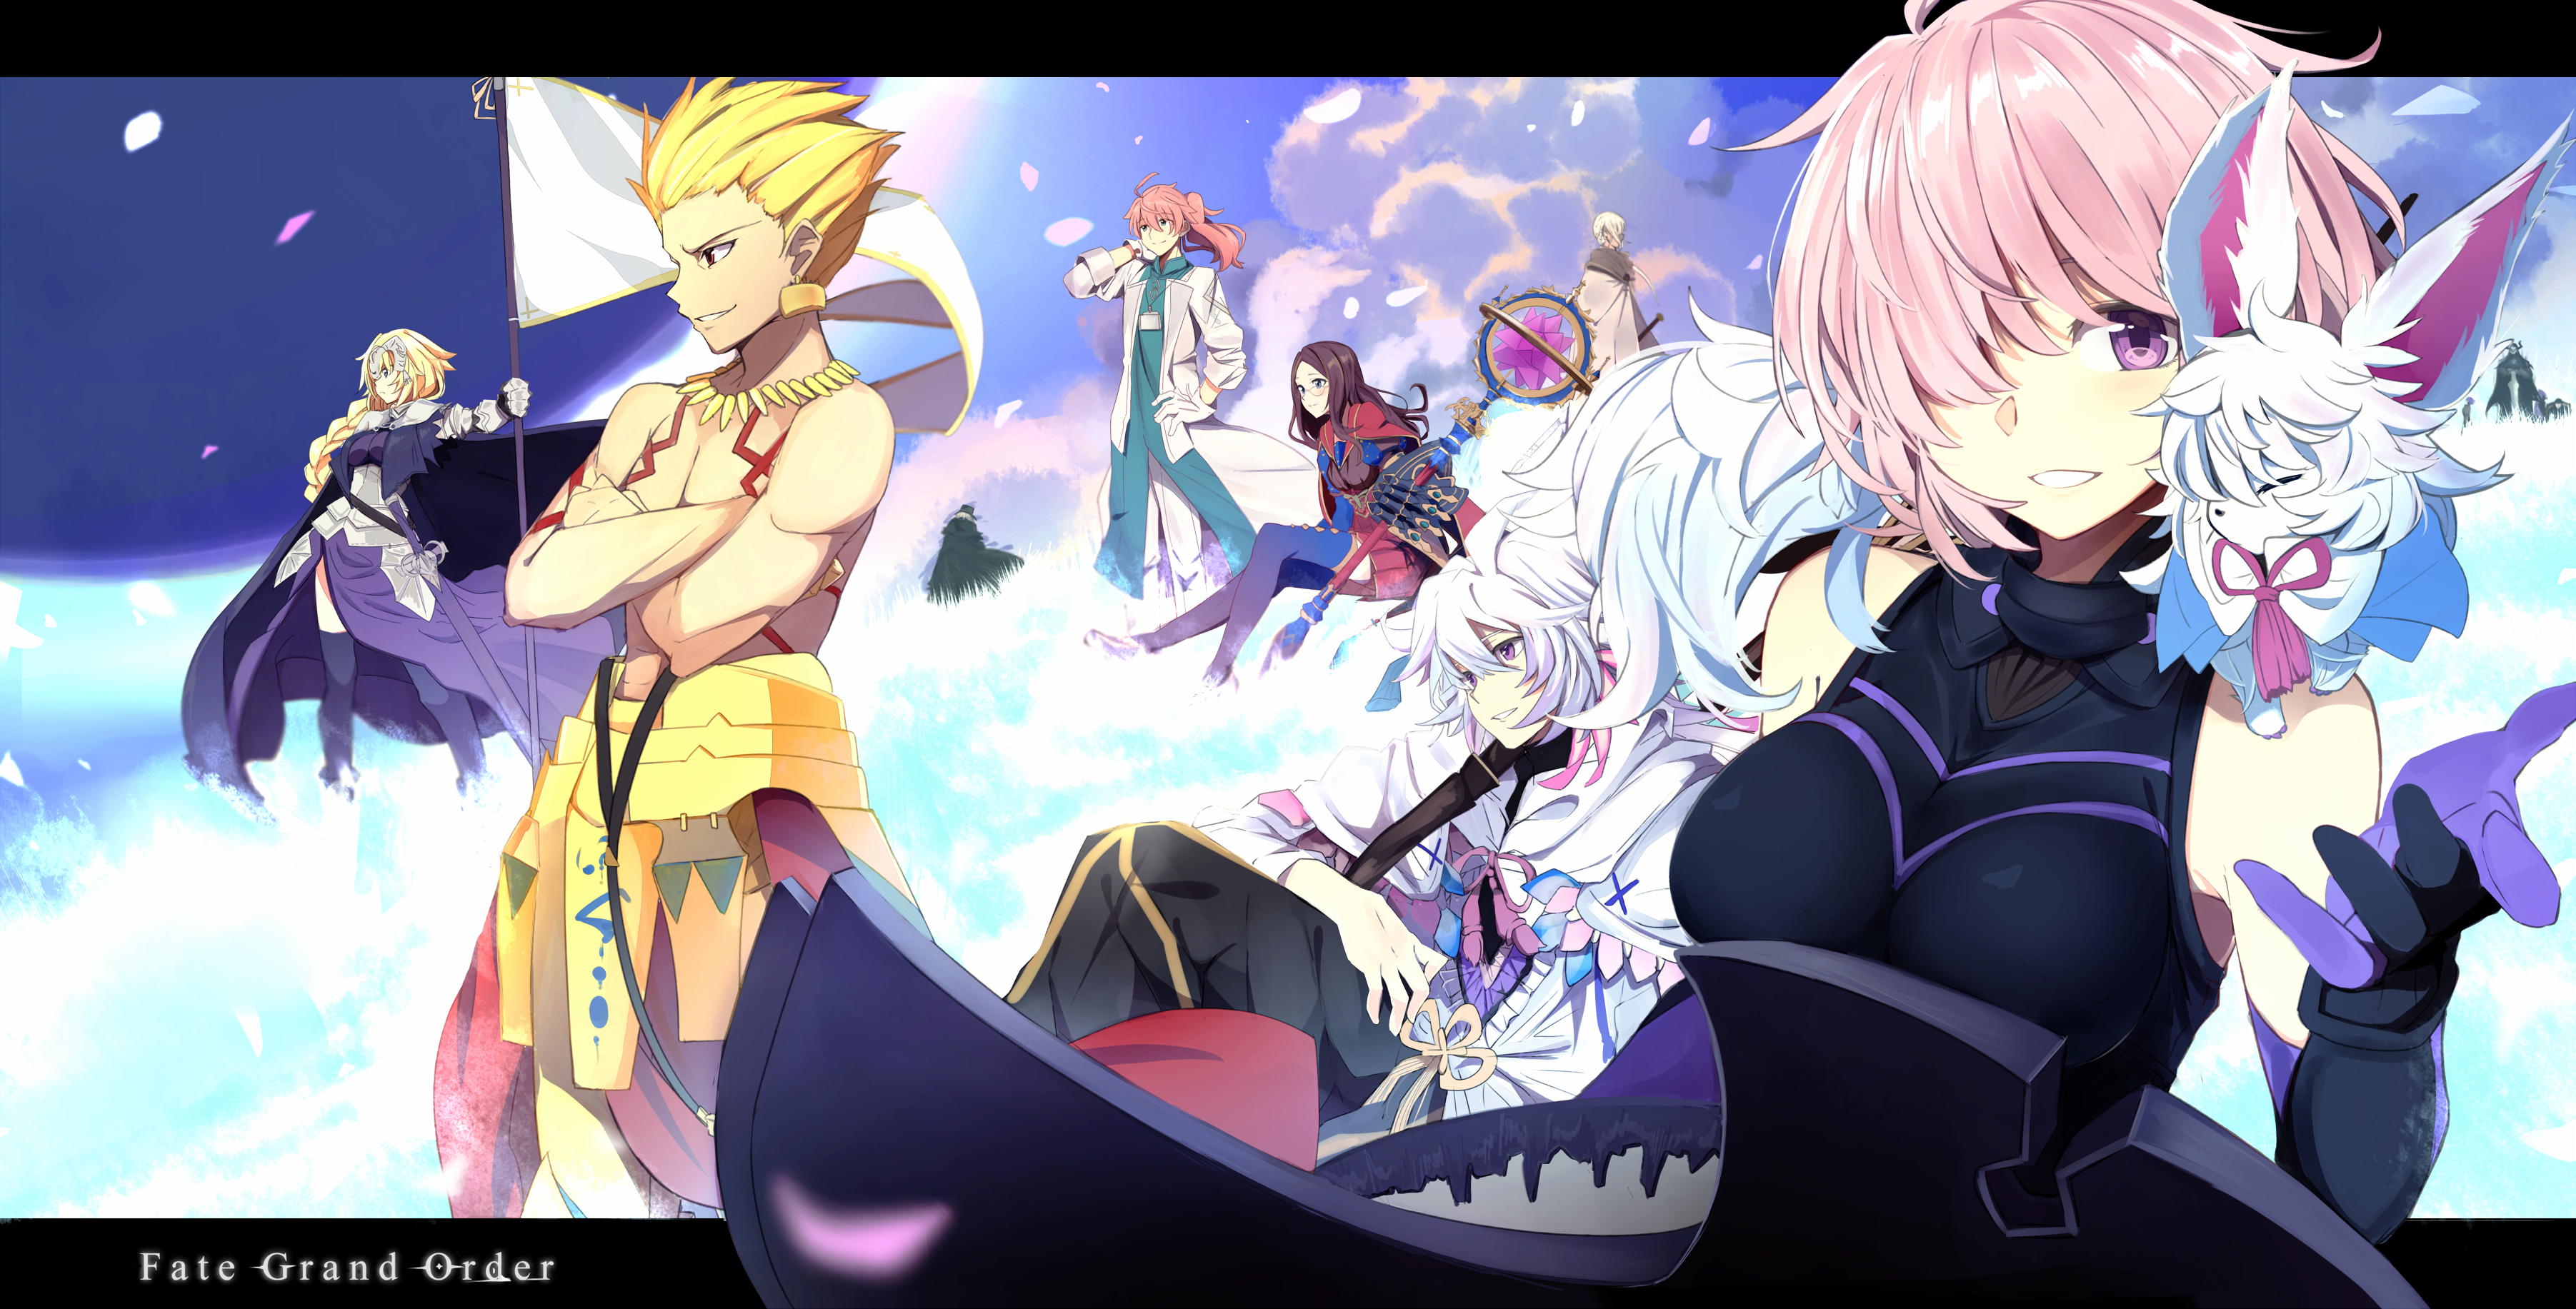 Shielder Fategrand Order Wallpaper Zerochan Anime